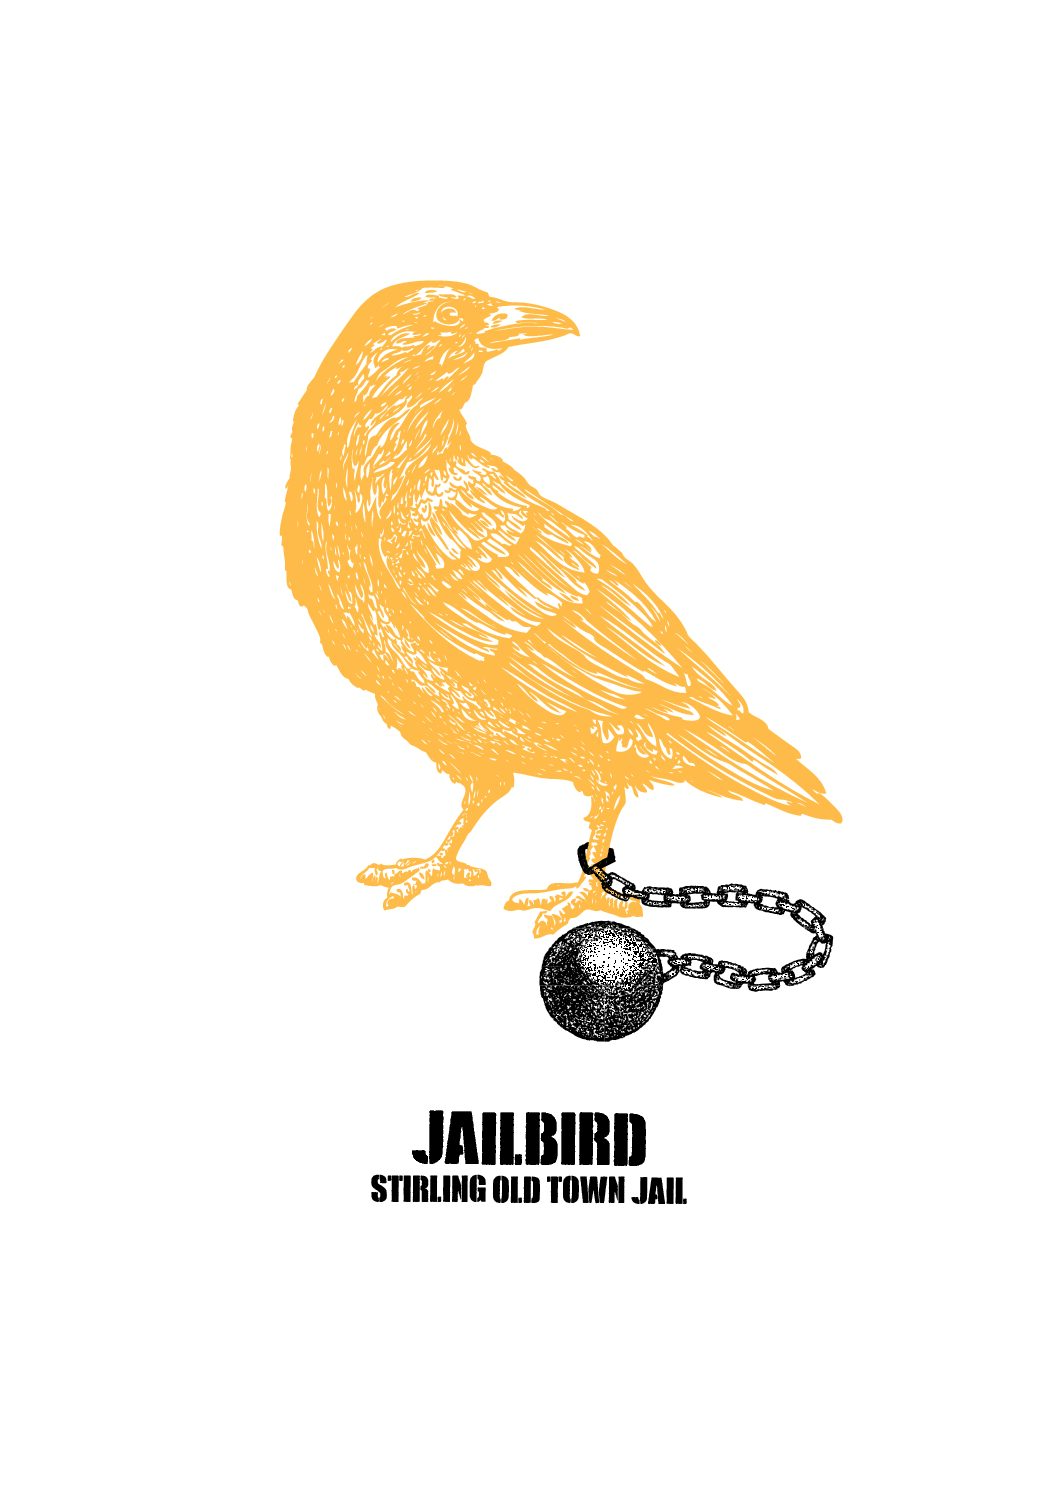 http://oldtownjail.co.uk/wp-content/uploads/2021/03/Jailbird-tee-pdf.jpg